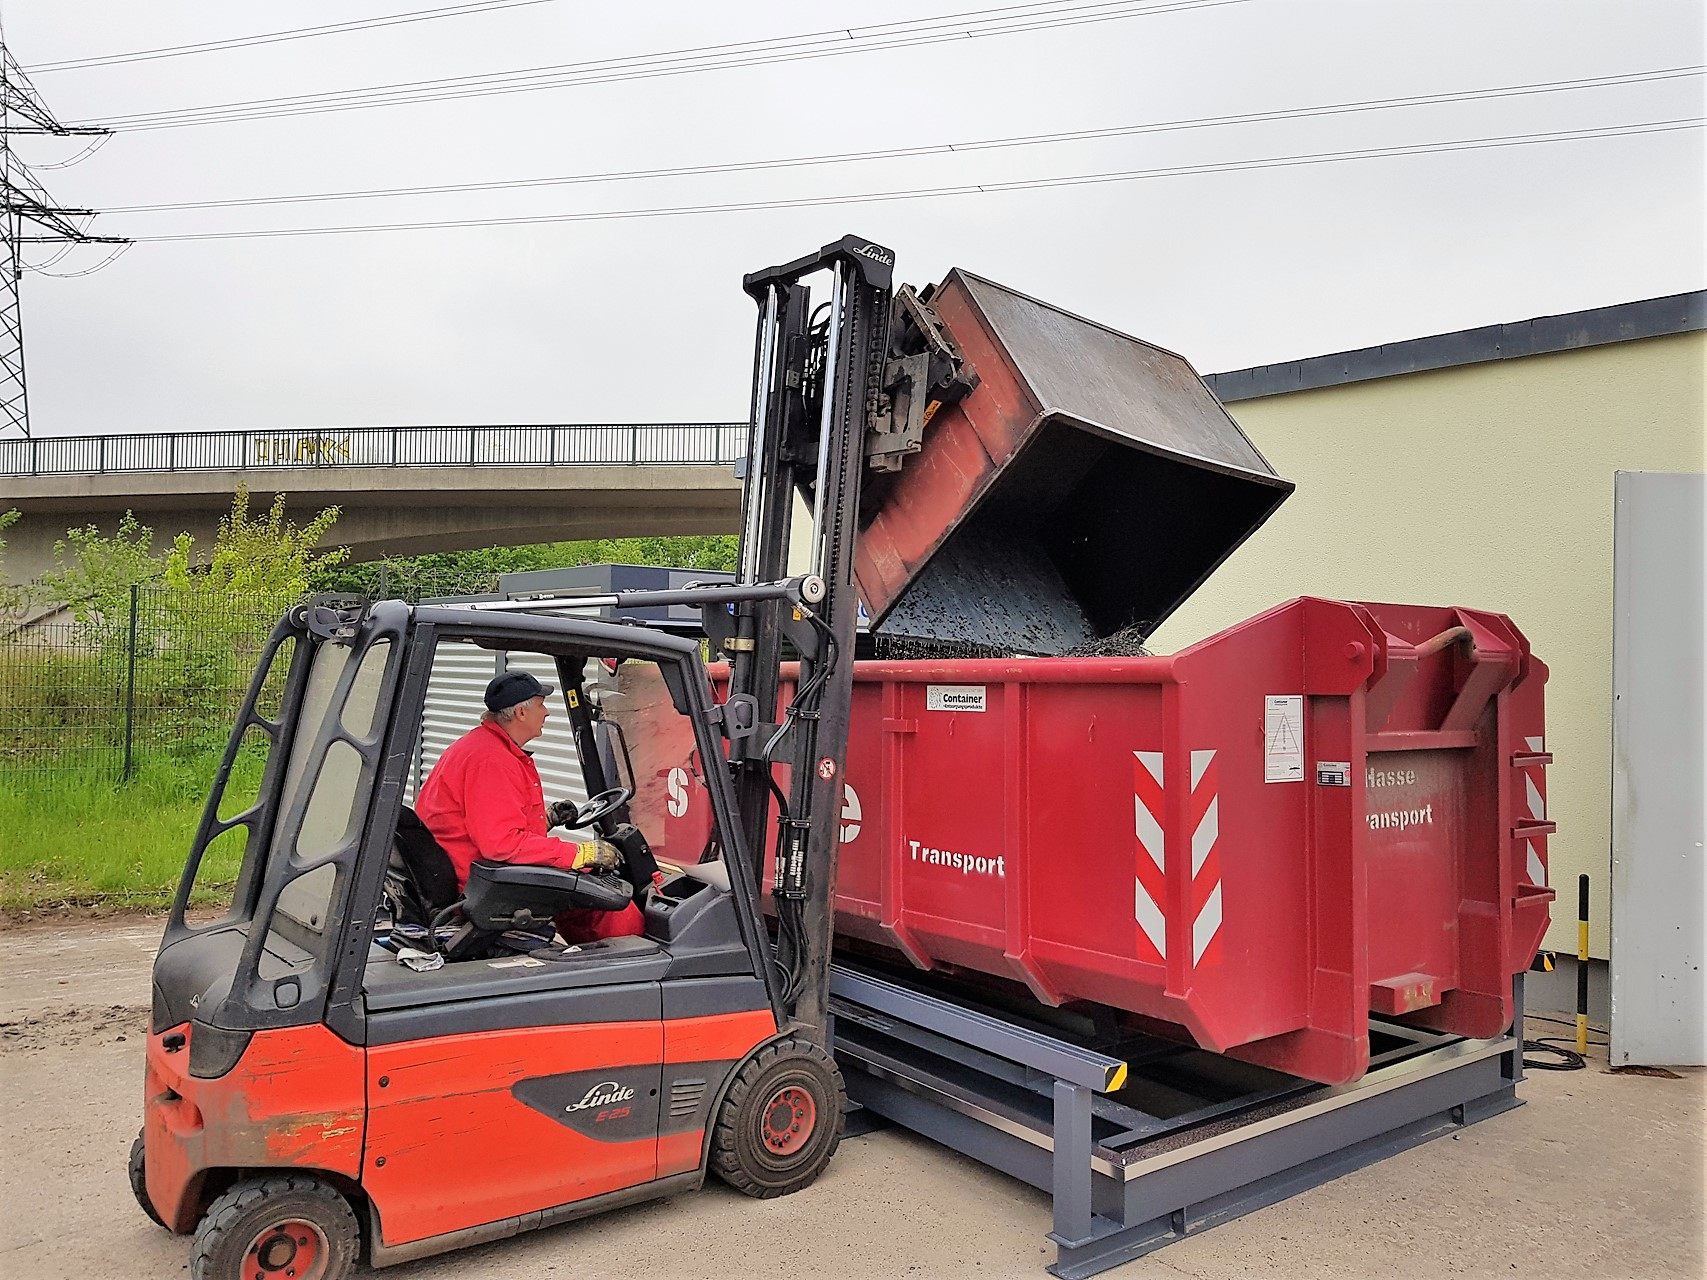 Abrollcontainer WHG konform lagern